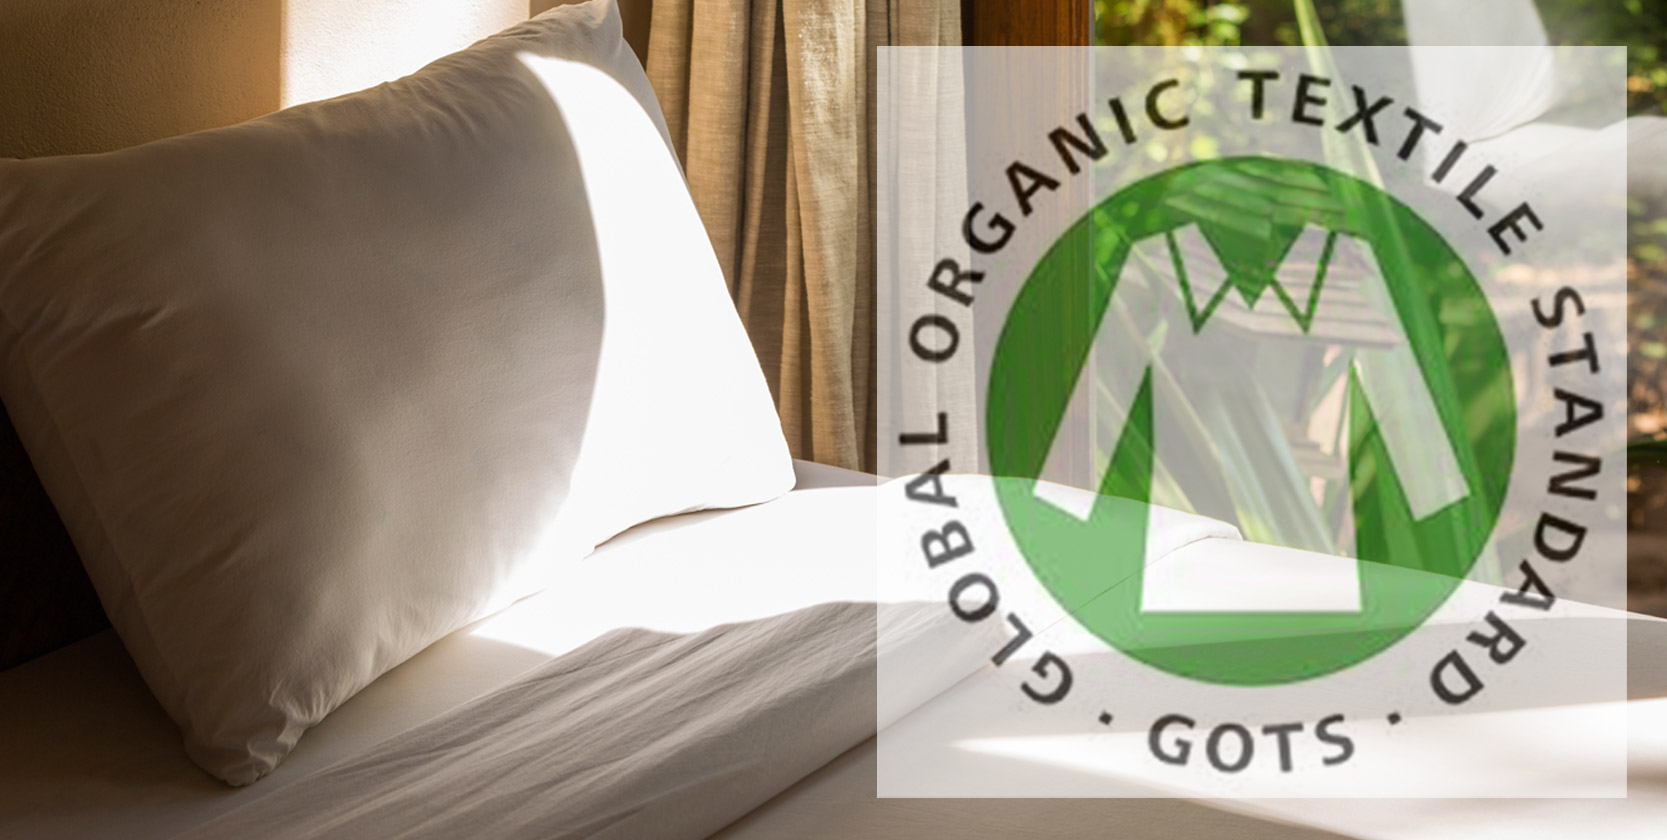 GOTS - Certified Organic Cotton Fabric